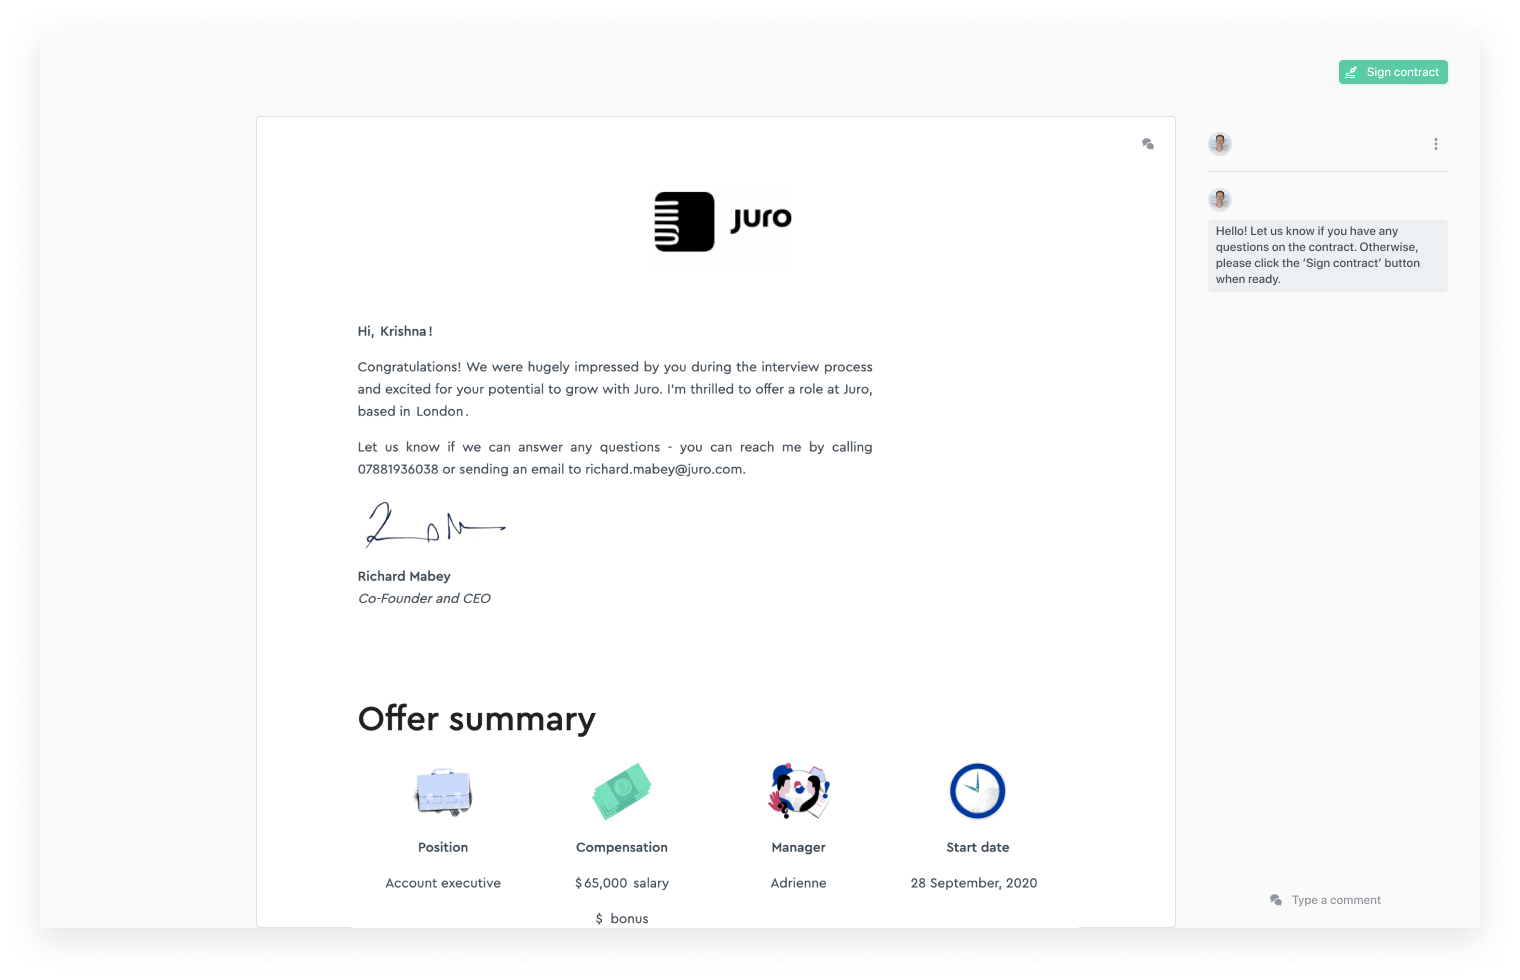 juro-employment-offer-letter-UI